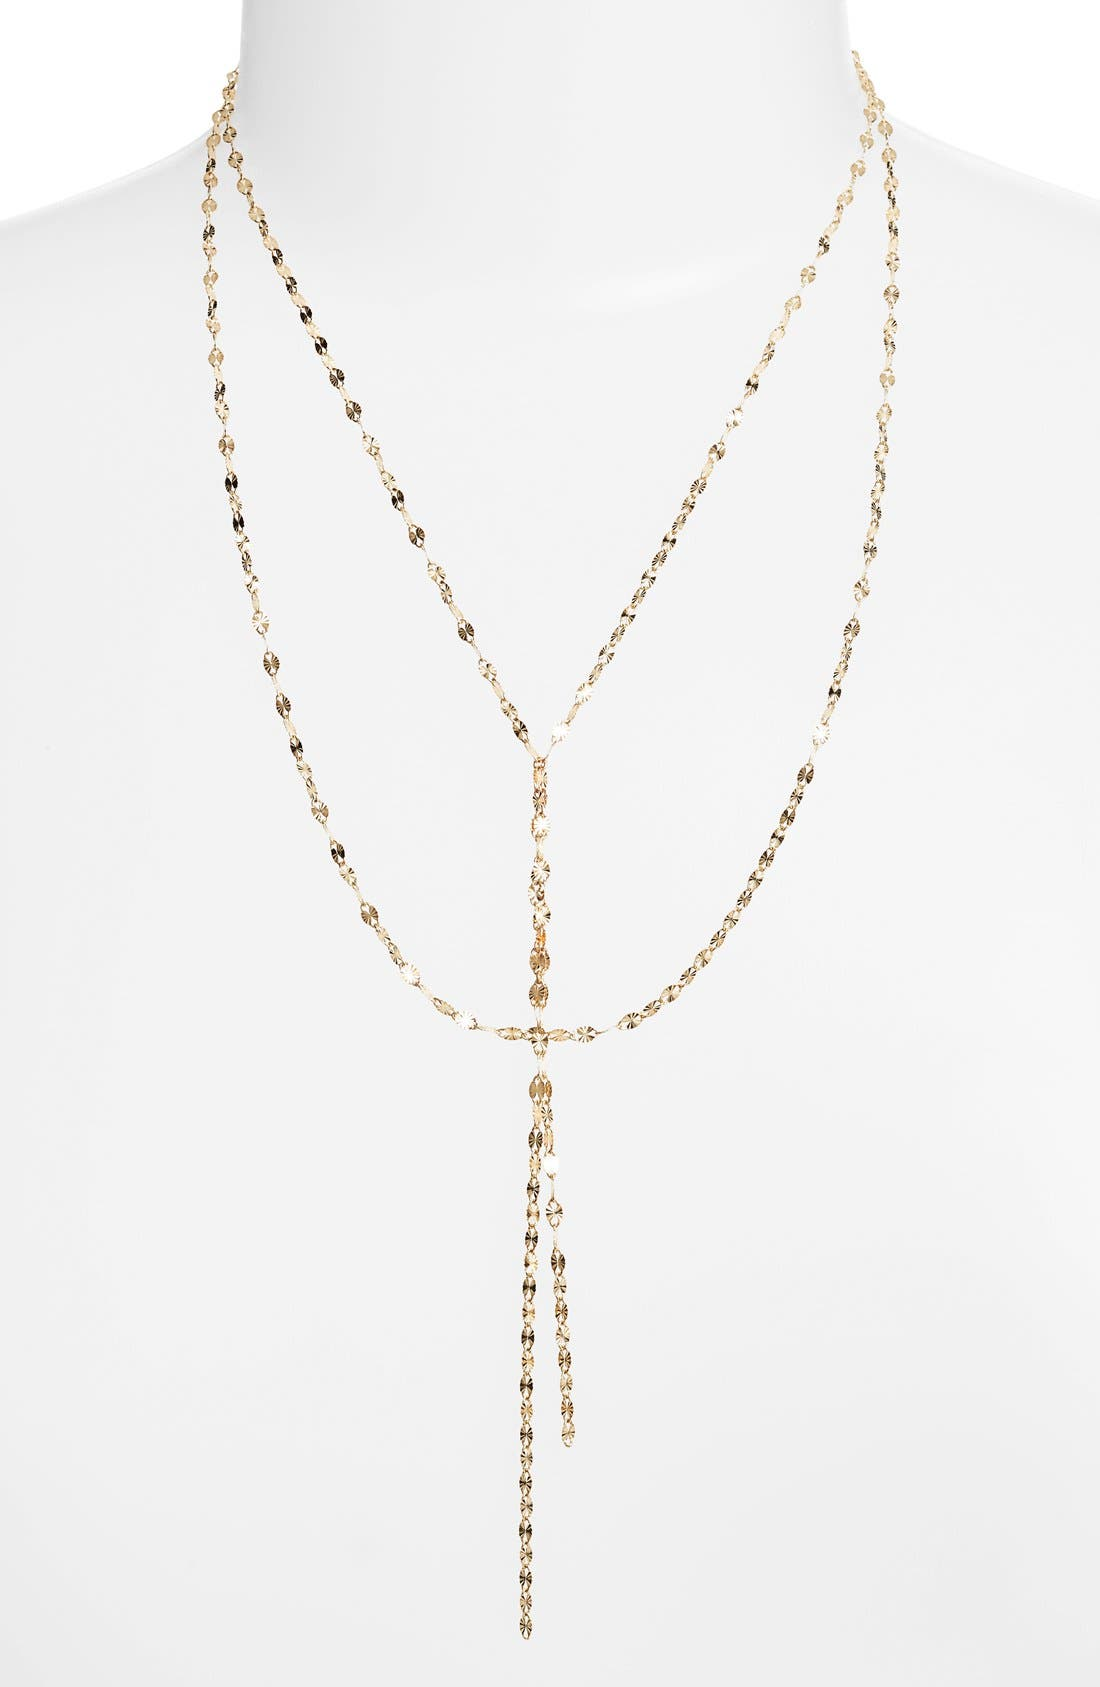 Main Image - Lana Jewelry 'Mega Blake' Lariat Necklace